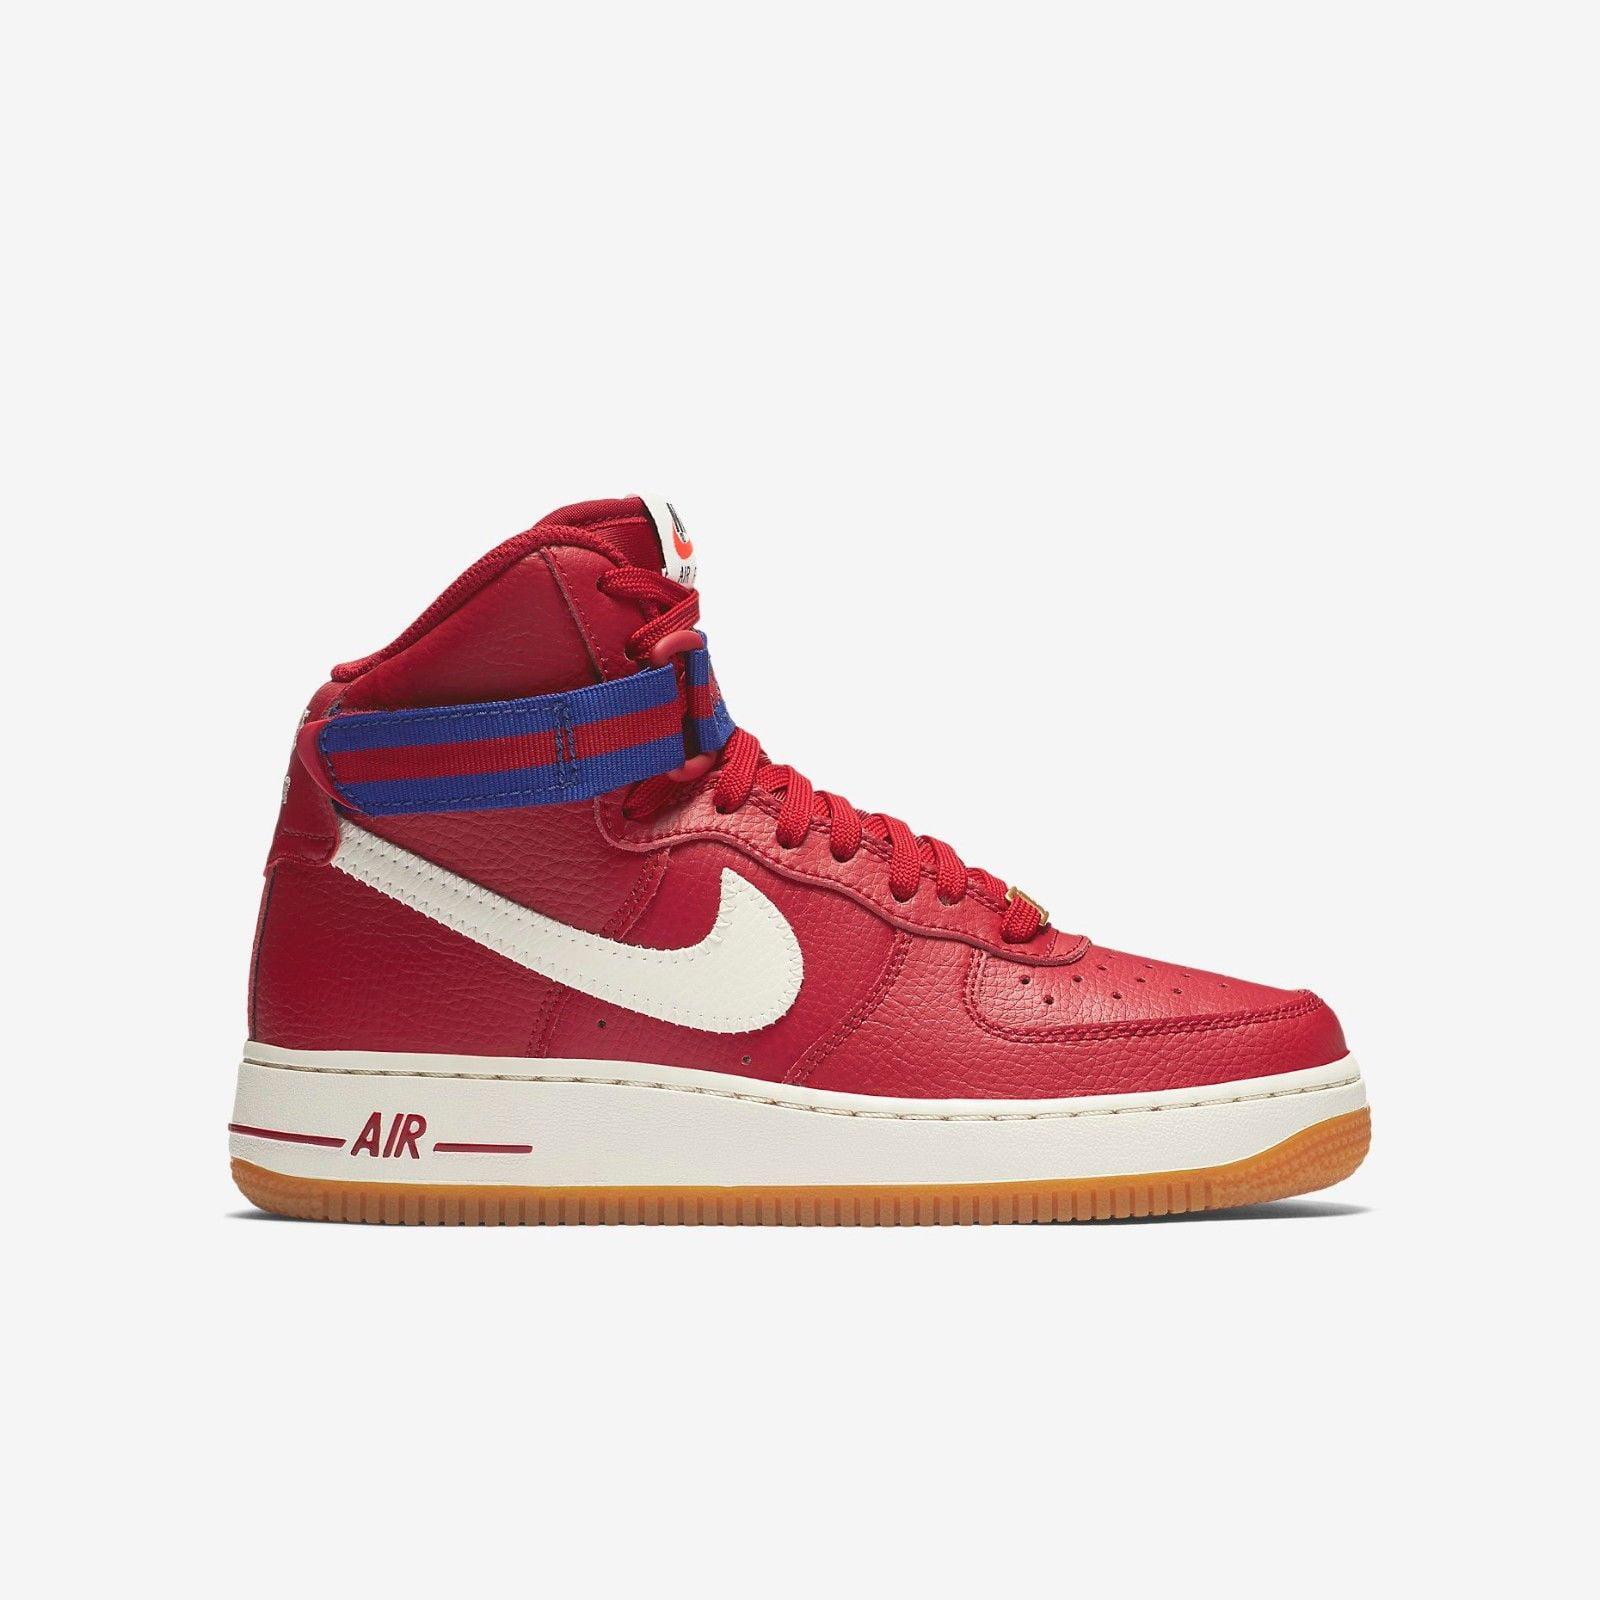 nike air force giovanile alto gs scarpe (653998 605) palestra red / deep royal